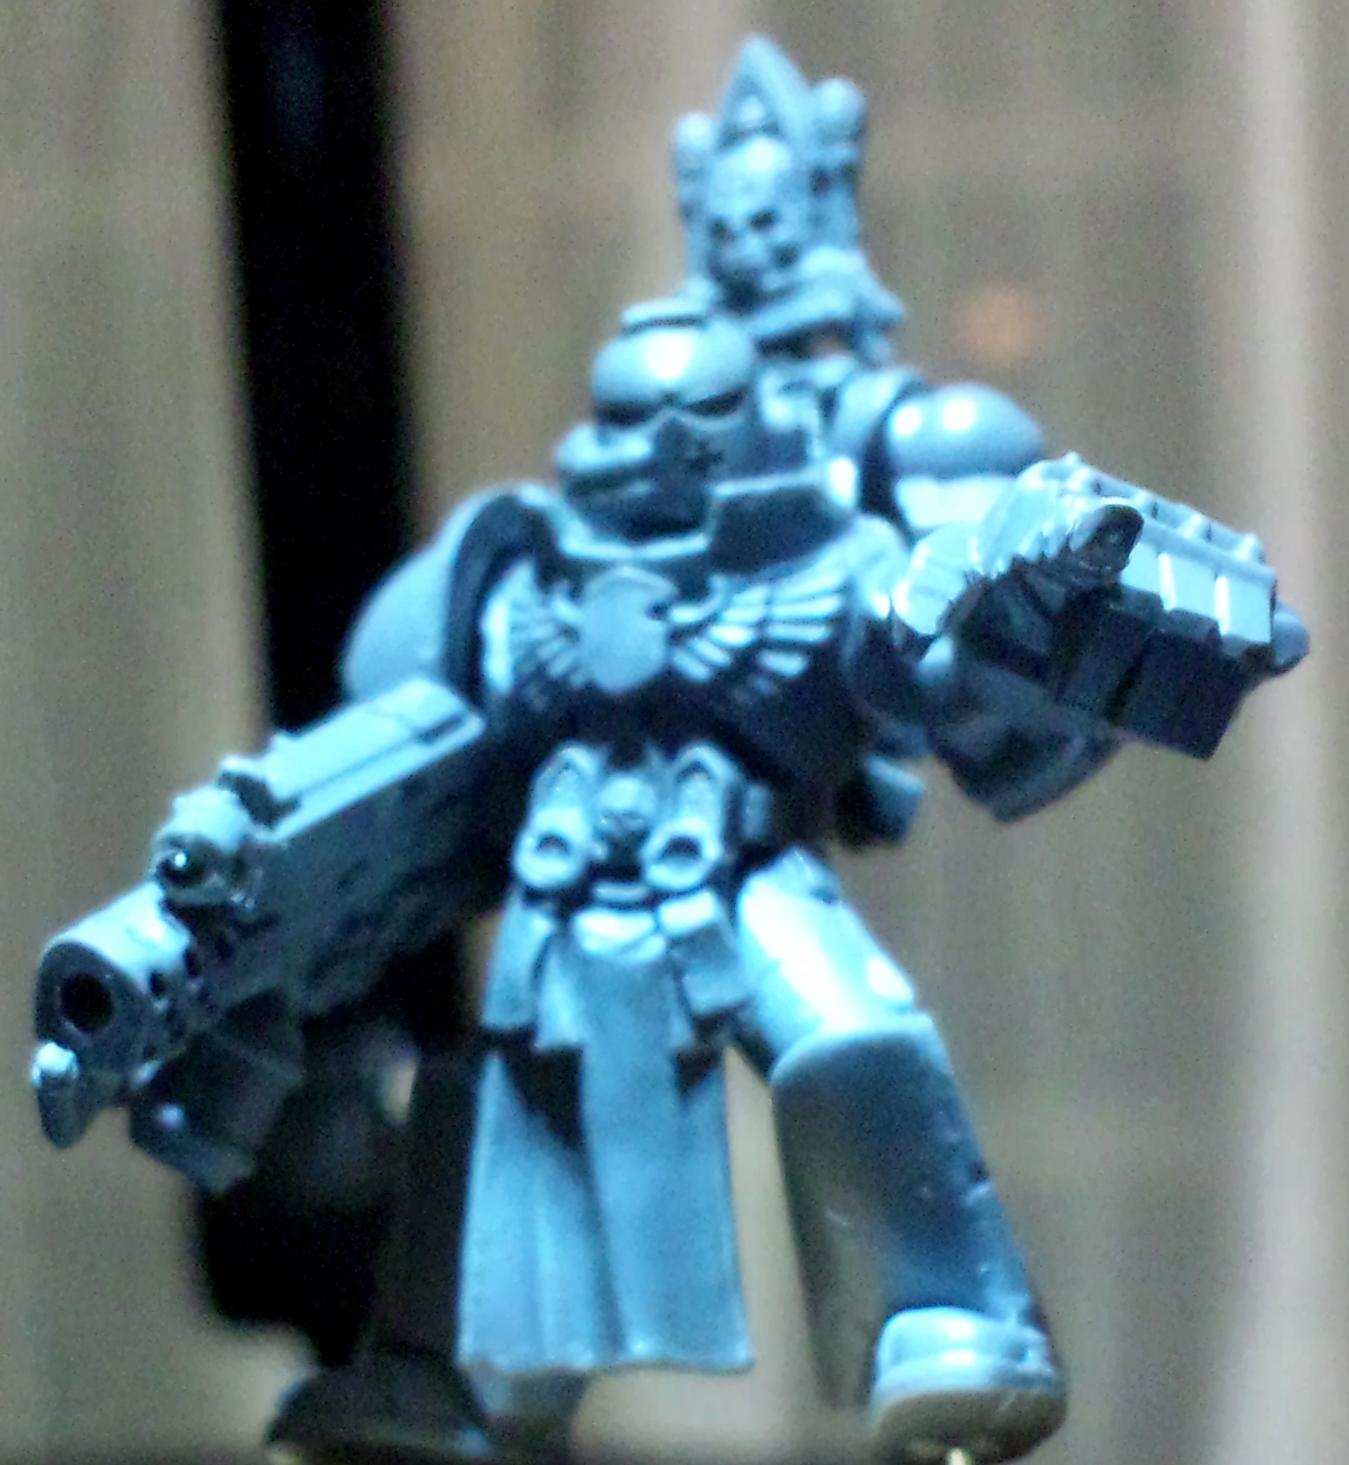 Sergeant Bling